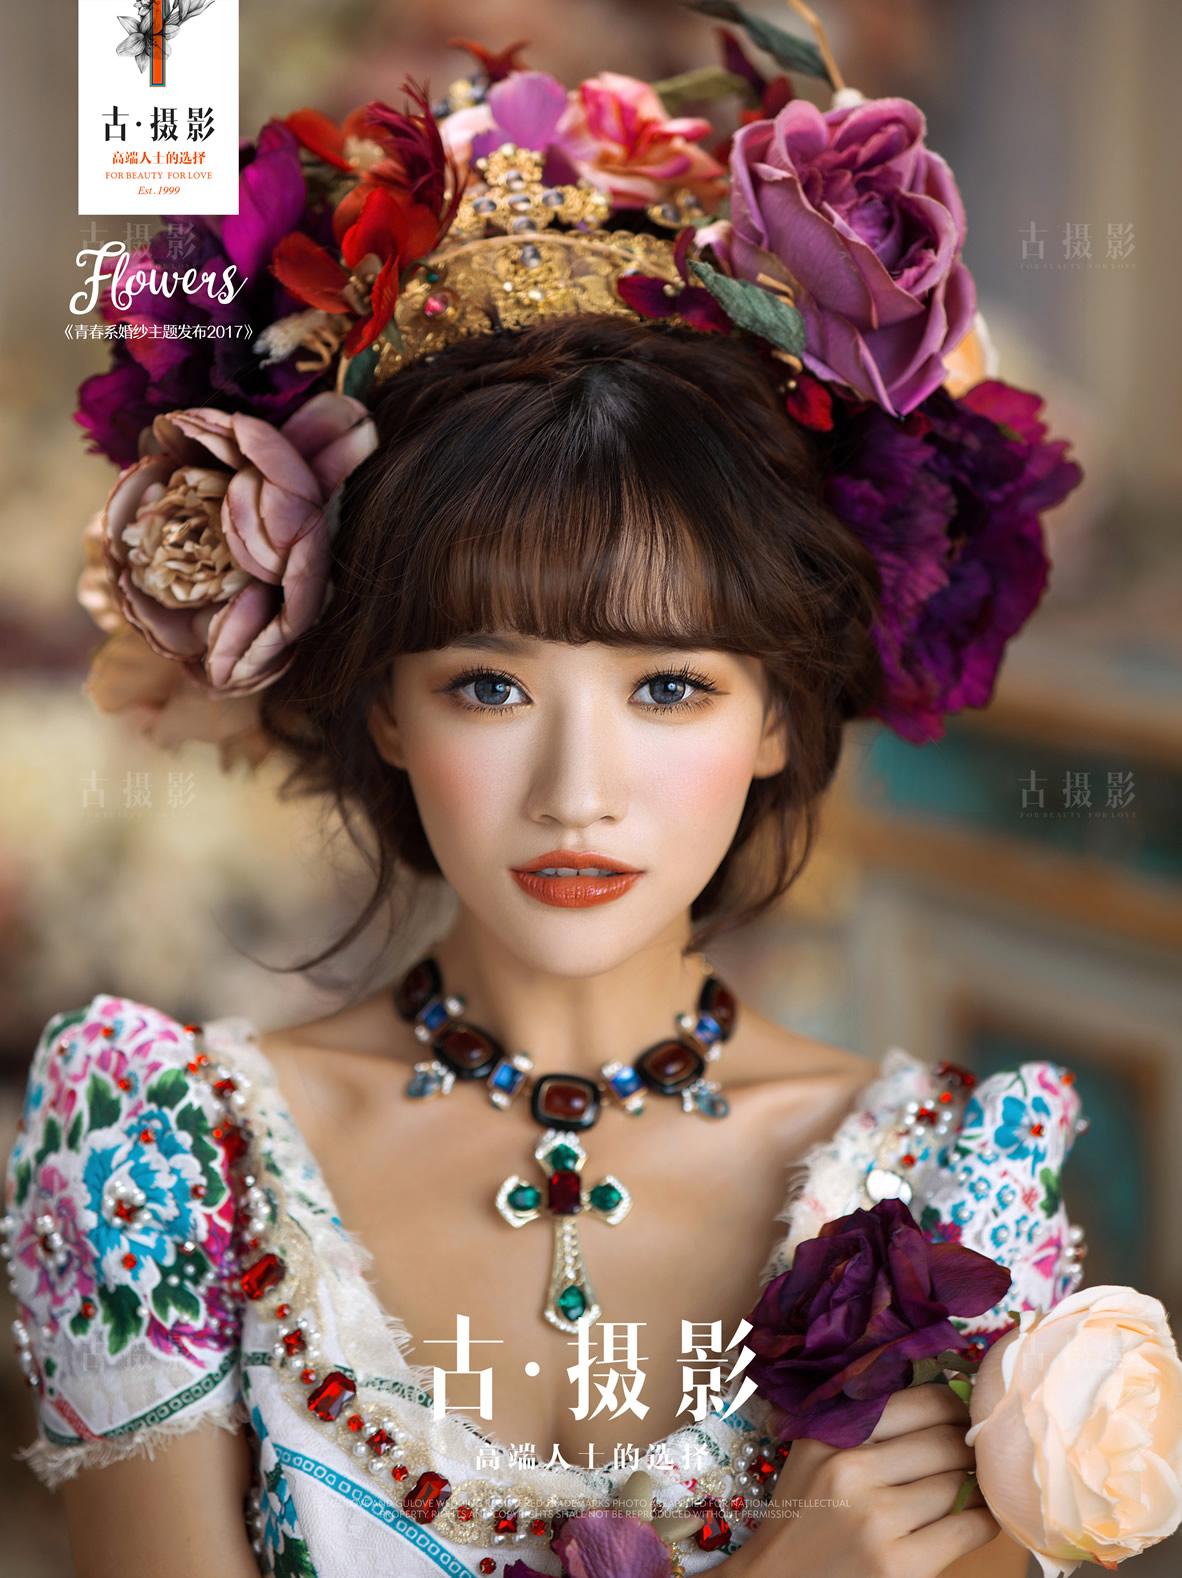 flowers - 明星范 - 广州婚纱摄影-广州古摄影官网